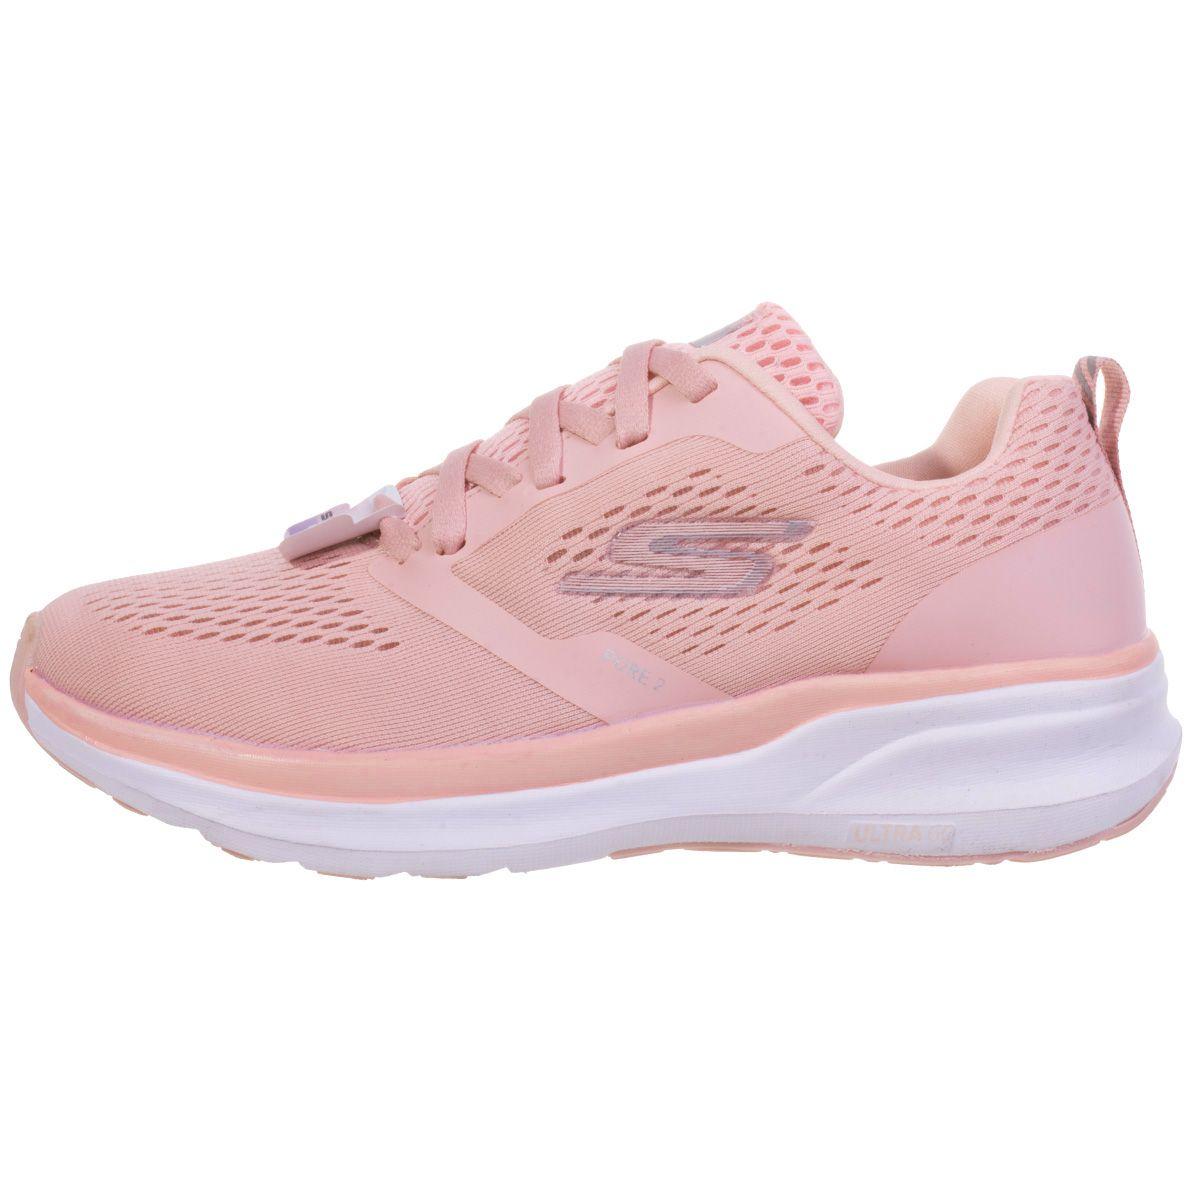 کفش مخصوص دویدن زنانه اسکچرز مدل GORUN PURE2 STRIKE PIN-1050160